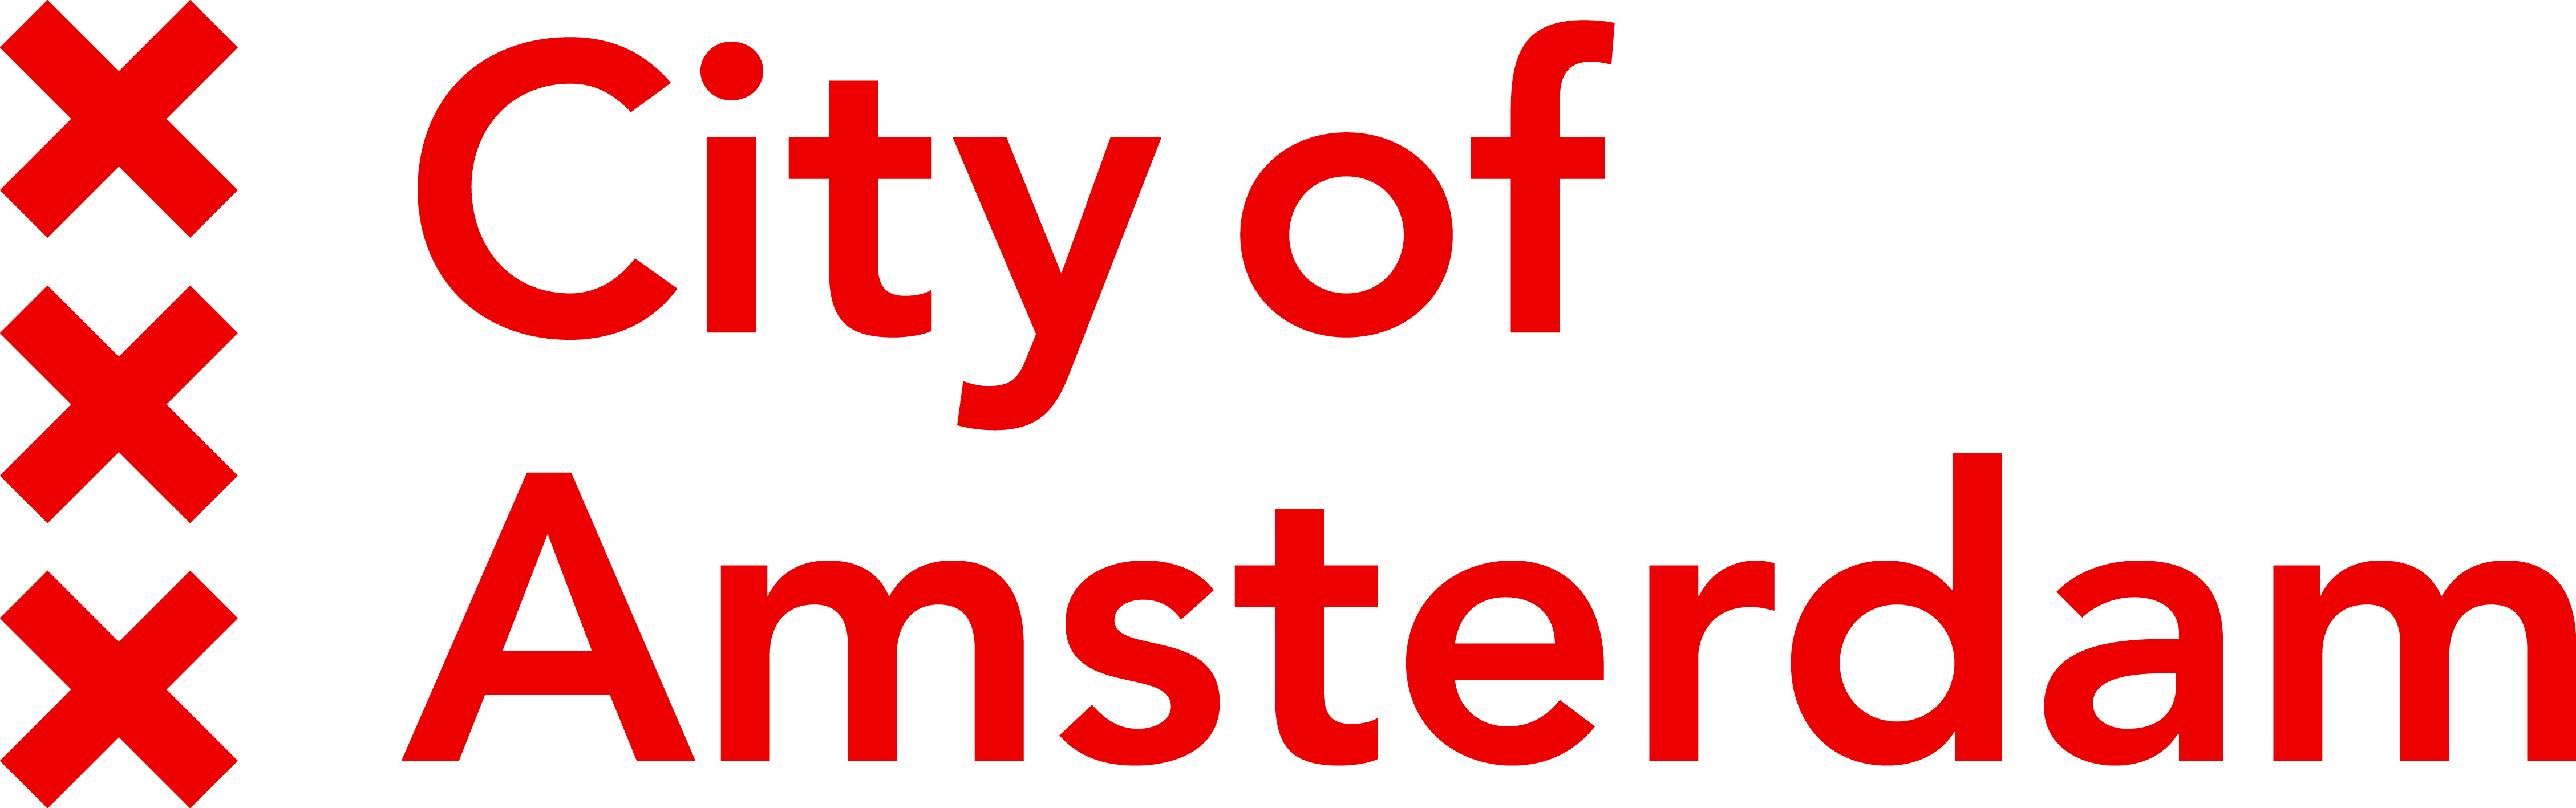 Amsterdam City logo